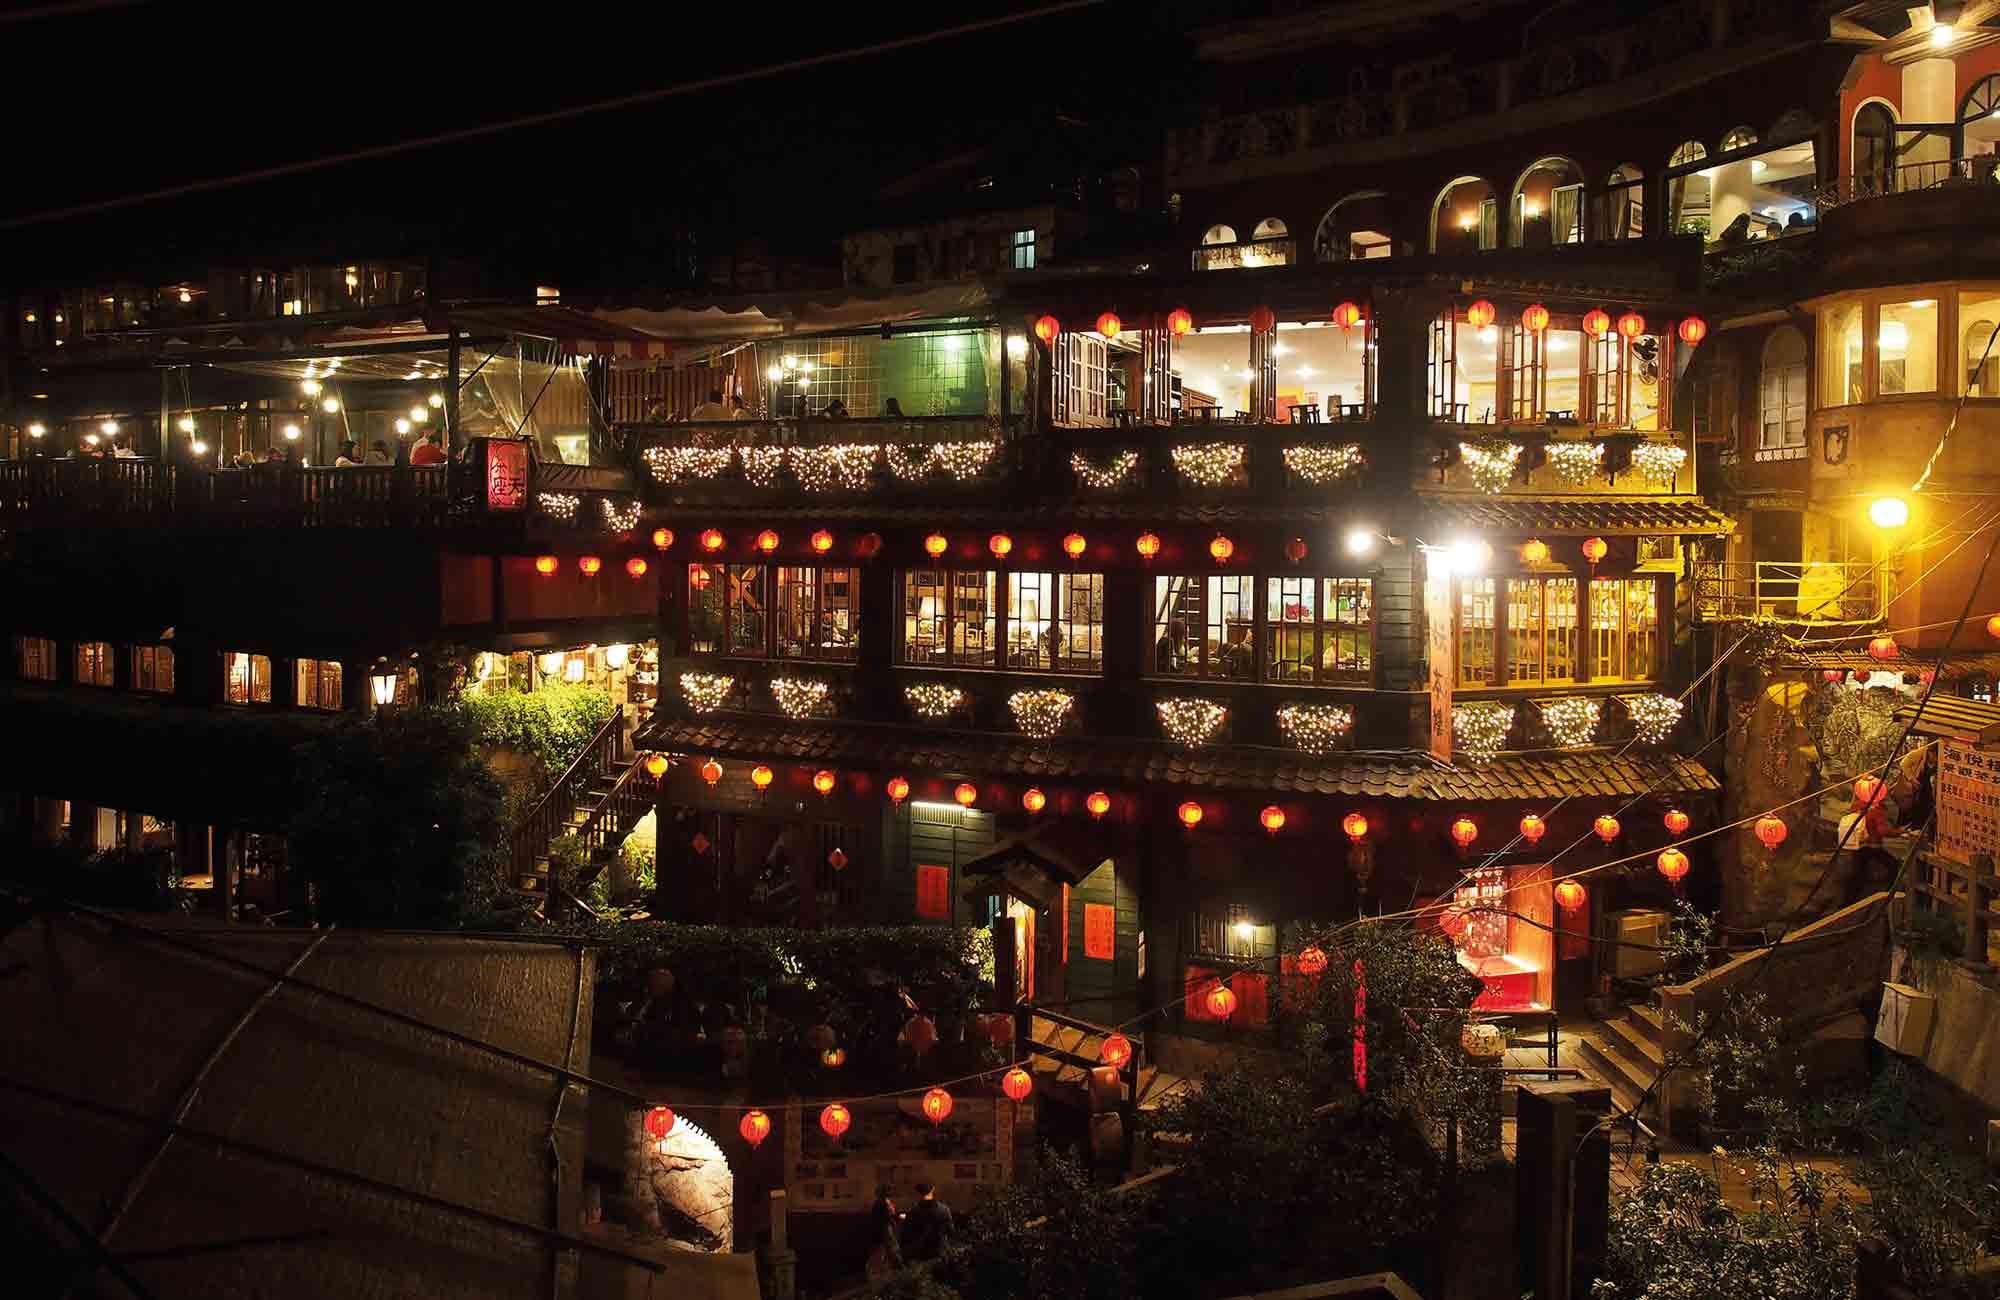 jiufen-taiwan-chihiro-inspiration-miyazaki-ghibli-amplitudes voyage